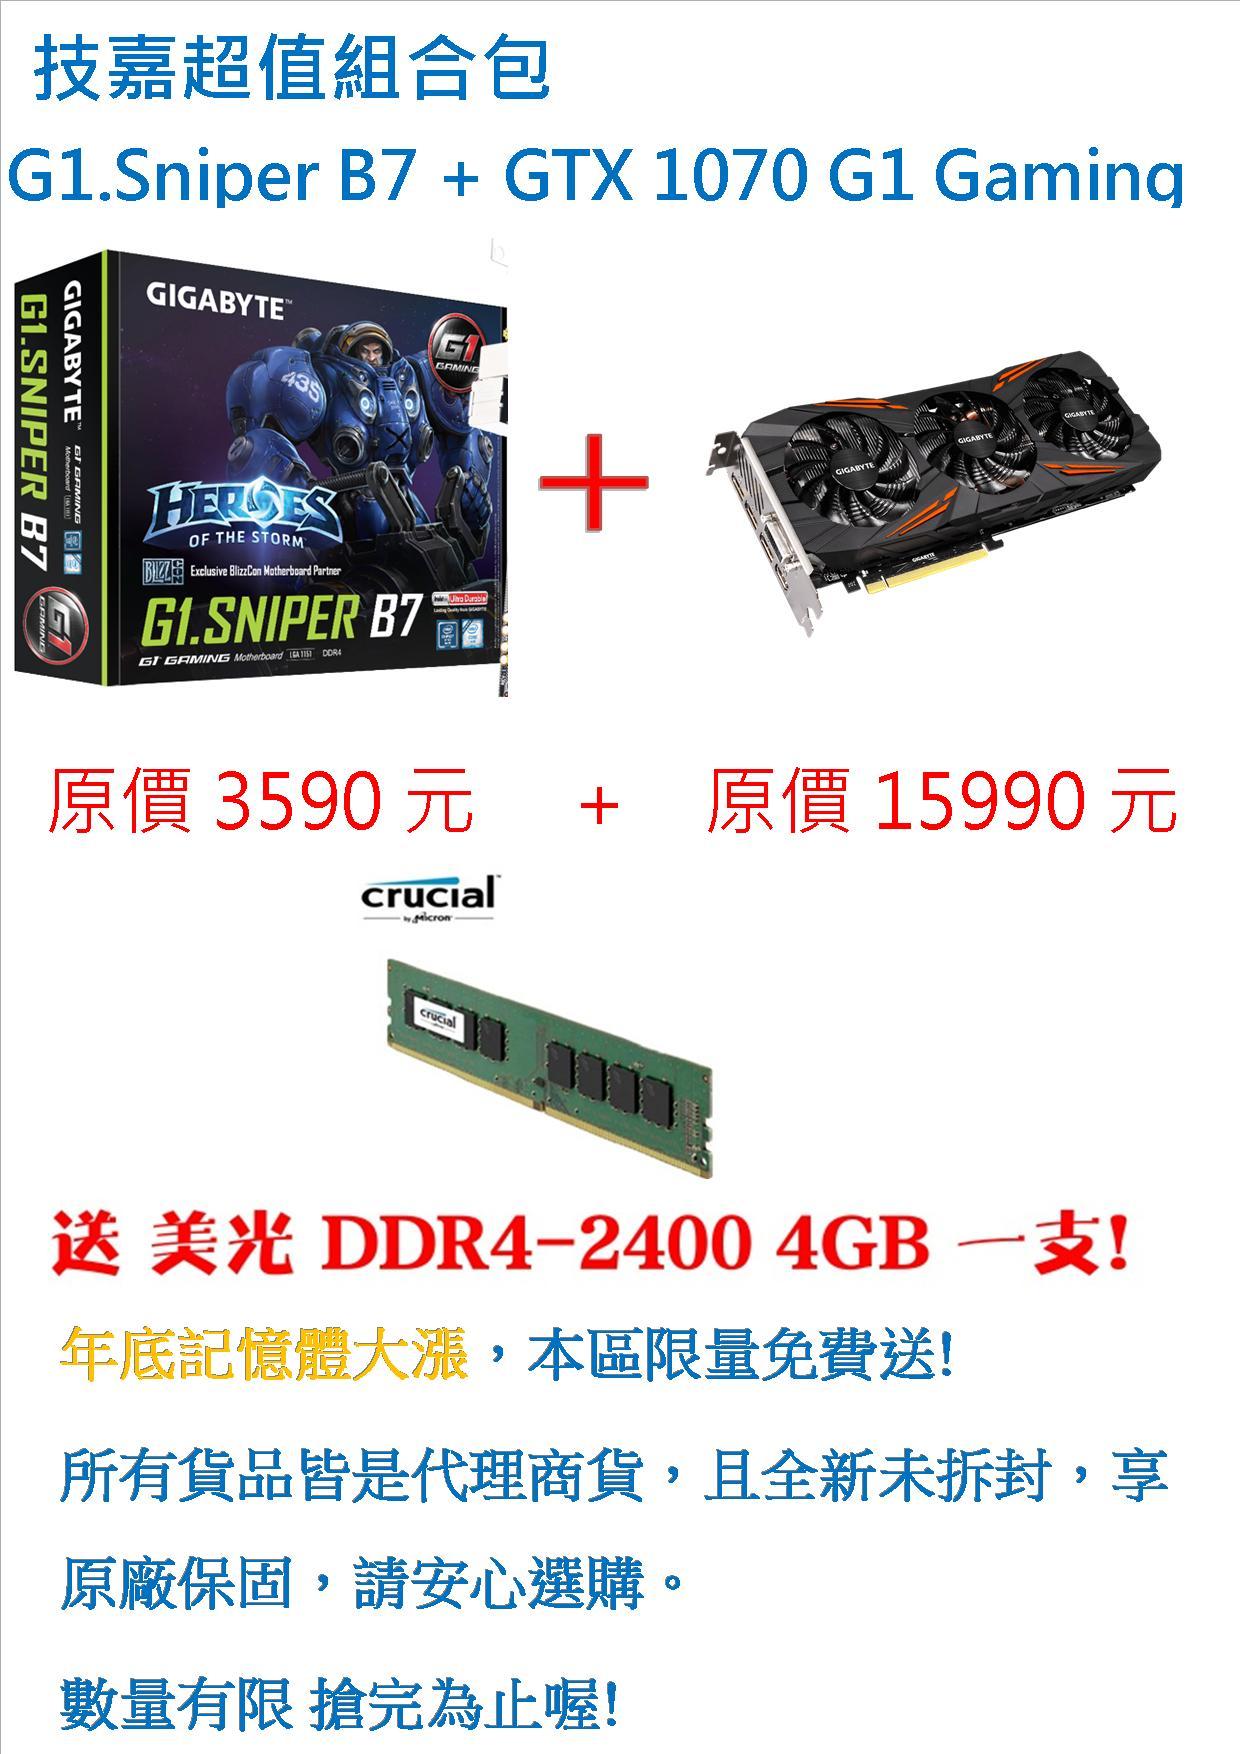 技嘉 G1.Sniper B7 + GTX 1070 8G G1 Gaming GIGABYTE 主機板 (送DDR4 4G )